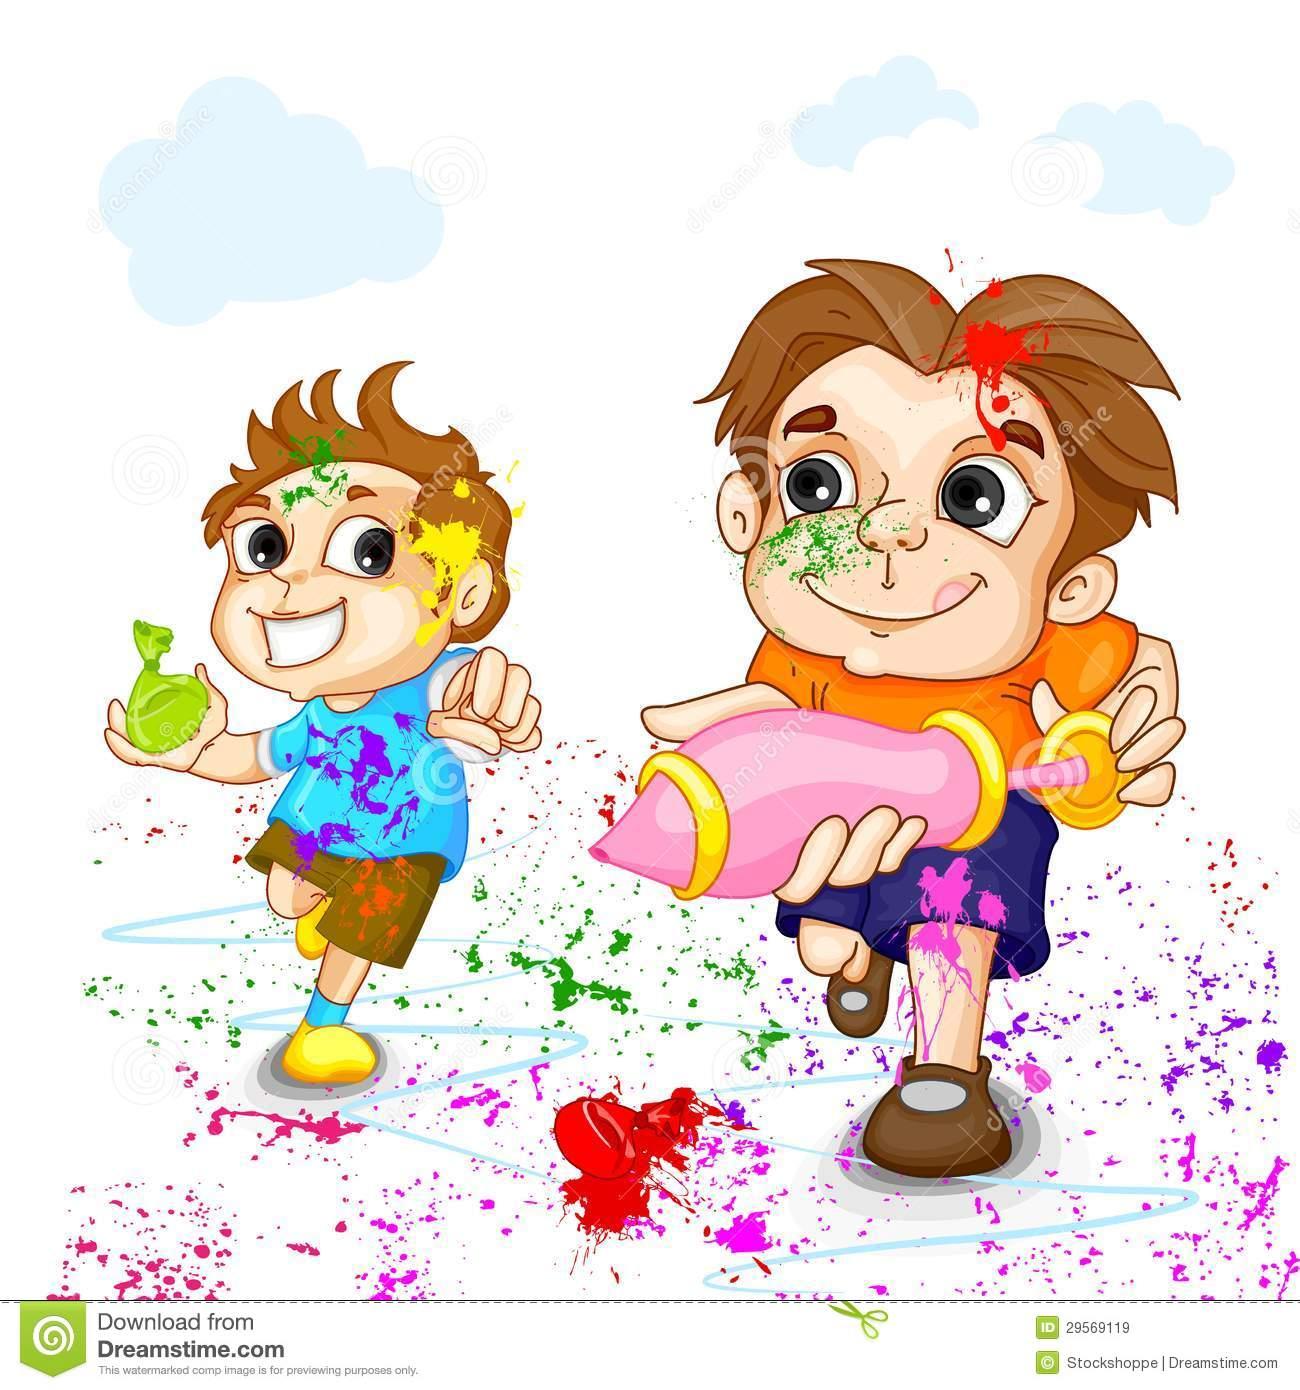 Festival clipart cartoon Cartoon Download Festival For Free